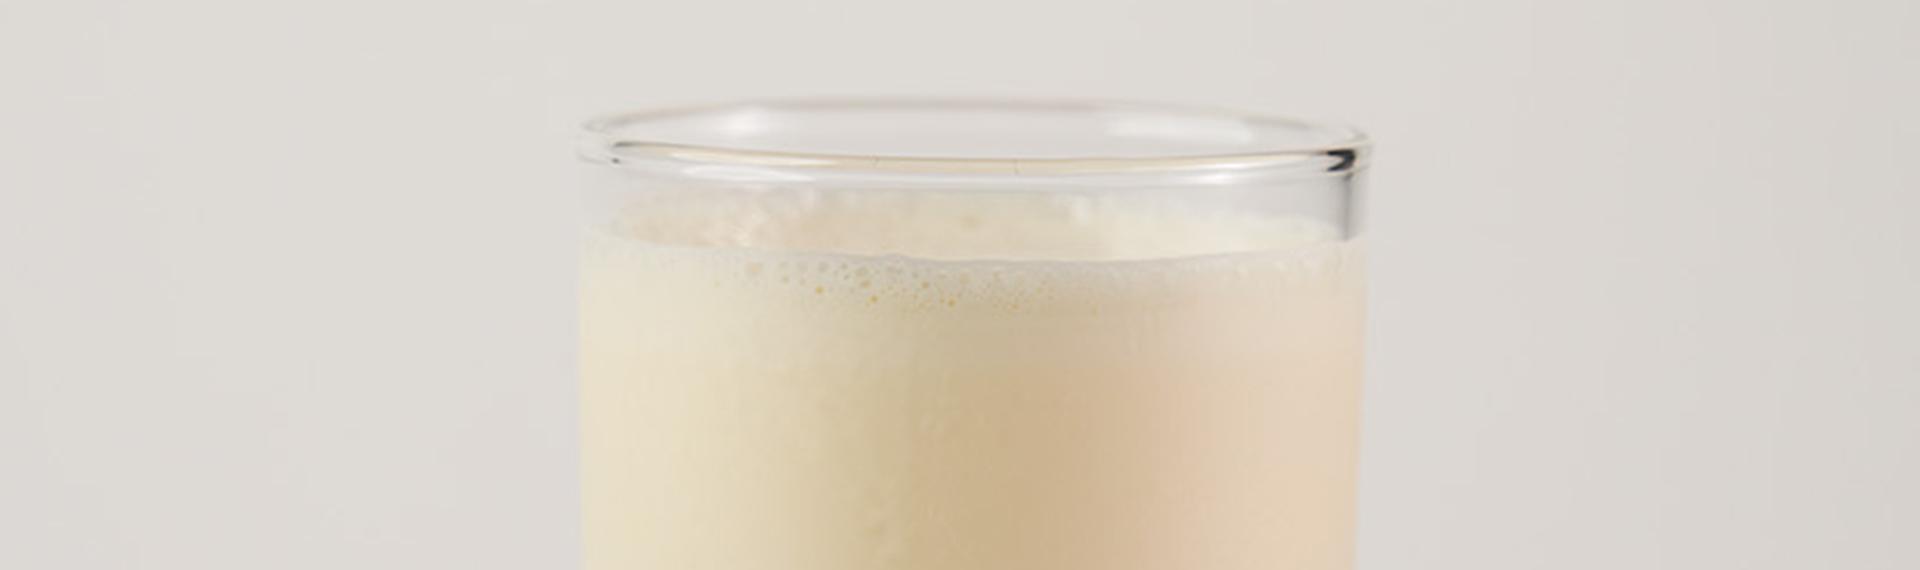 Quick Blend® Vanilla Milk Shake with Whole Milk